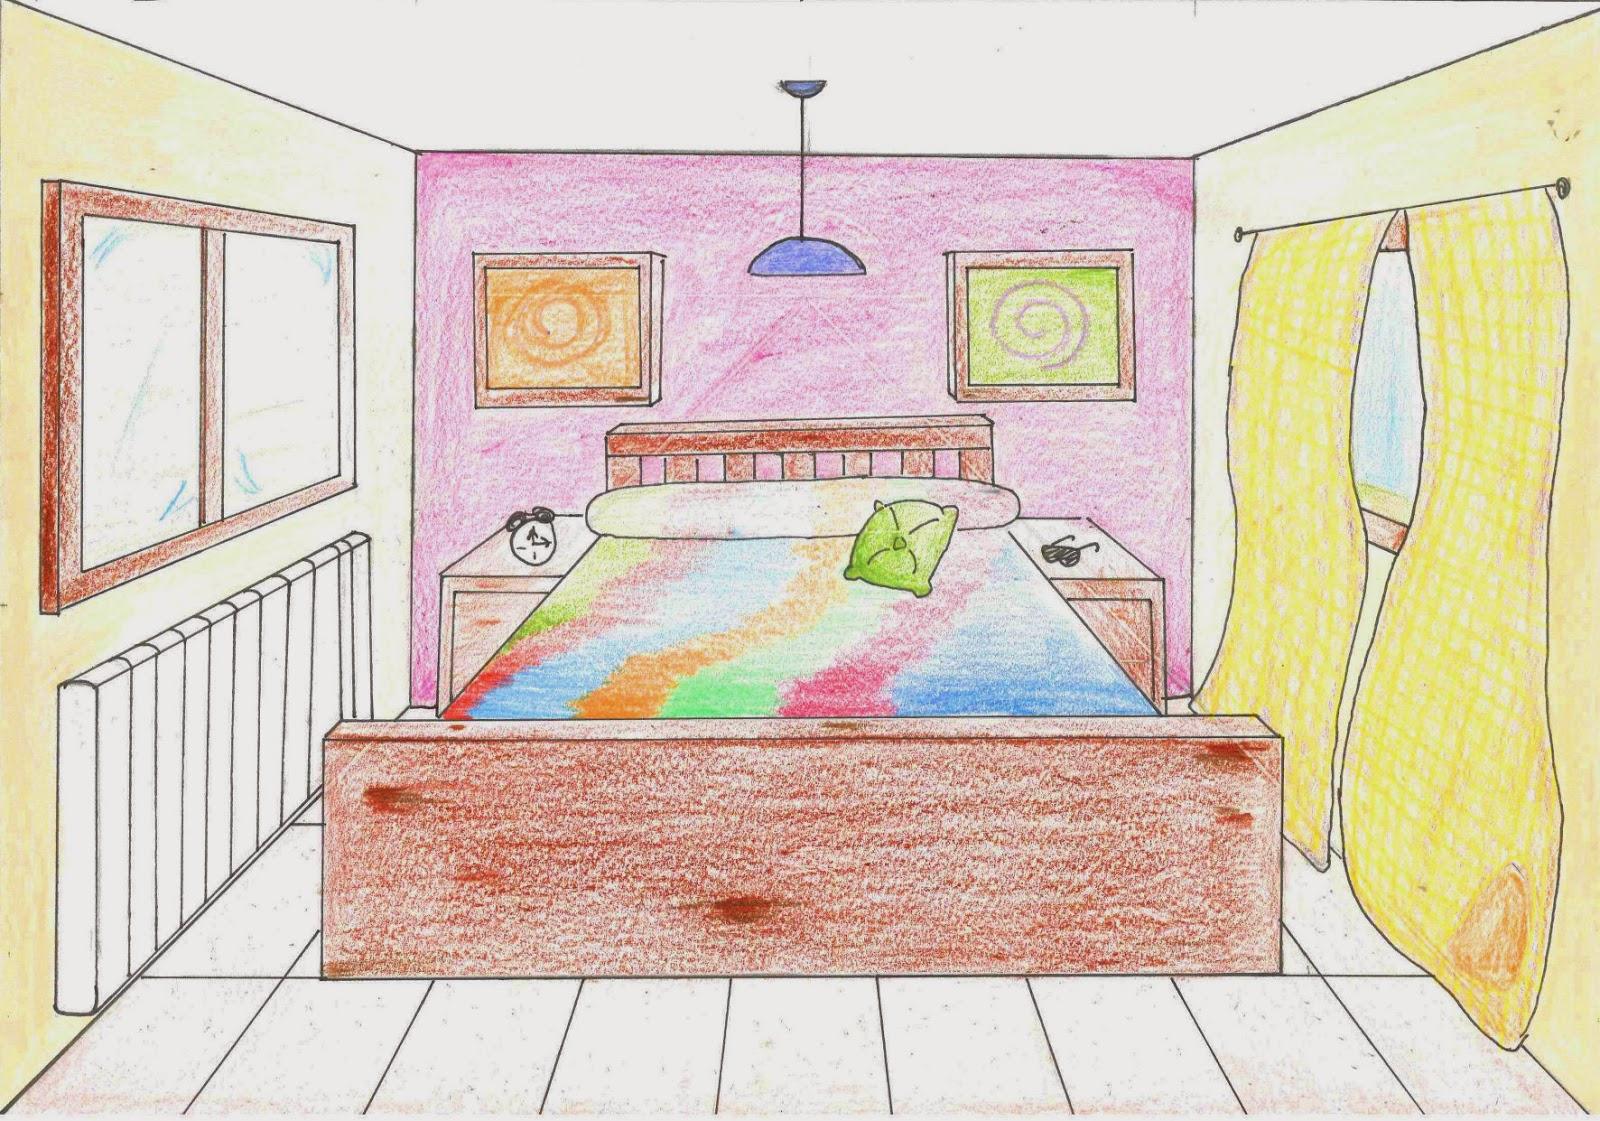 Lida pl stica habitaci en perspectiva c nica - Habitacion en perspectiva conica ...